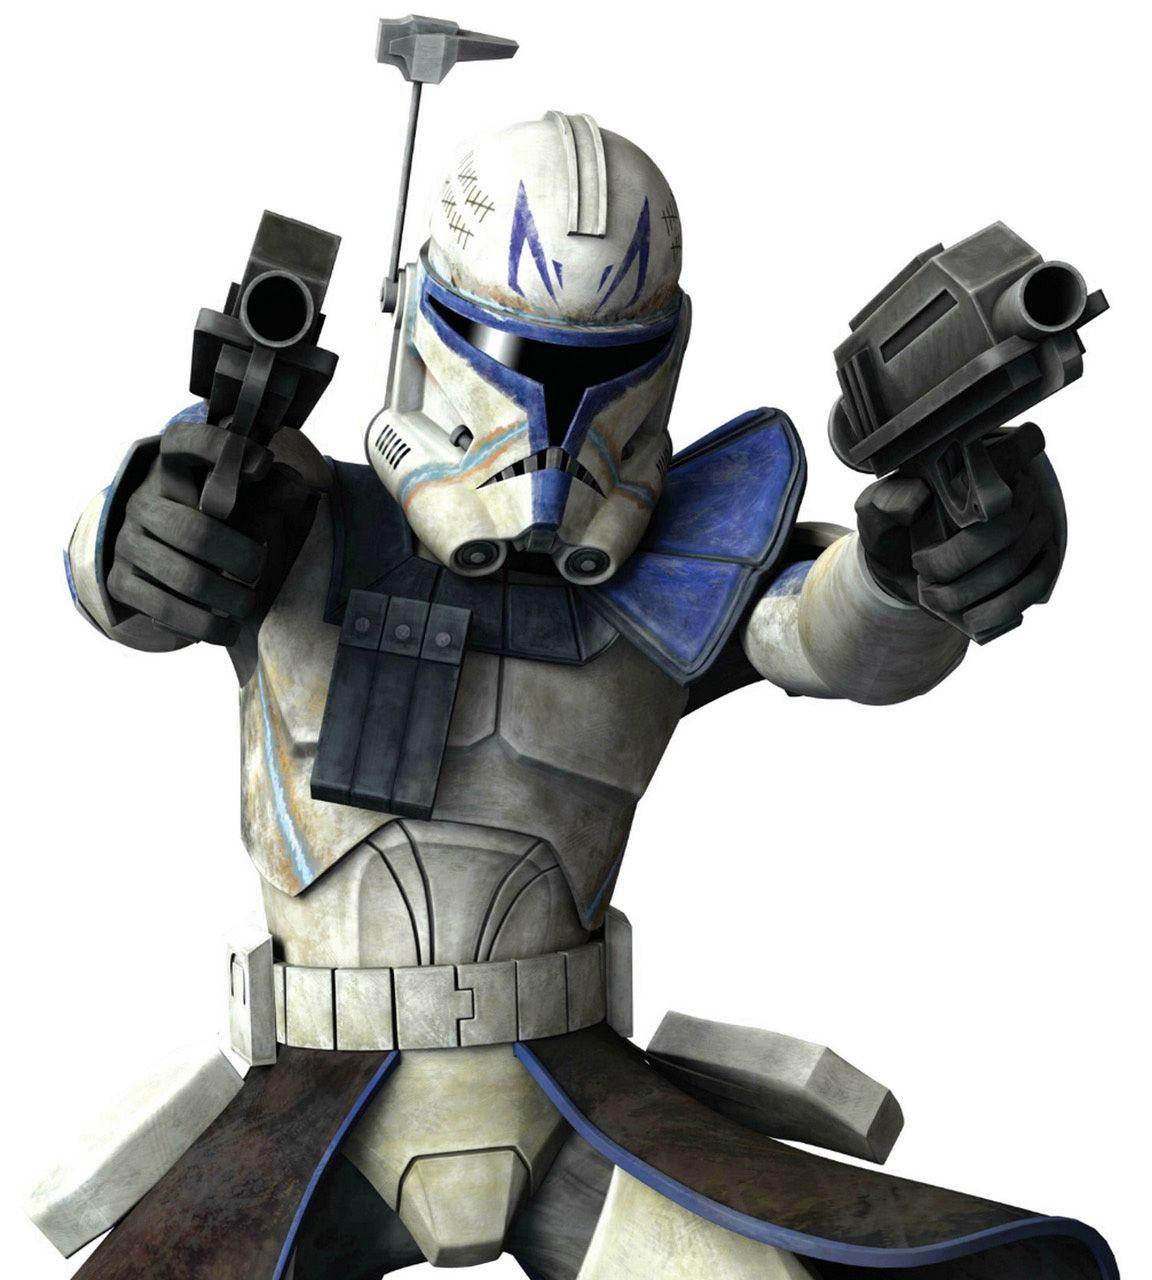 star wars clone wars vehicles - Google Search | Star Wars ...